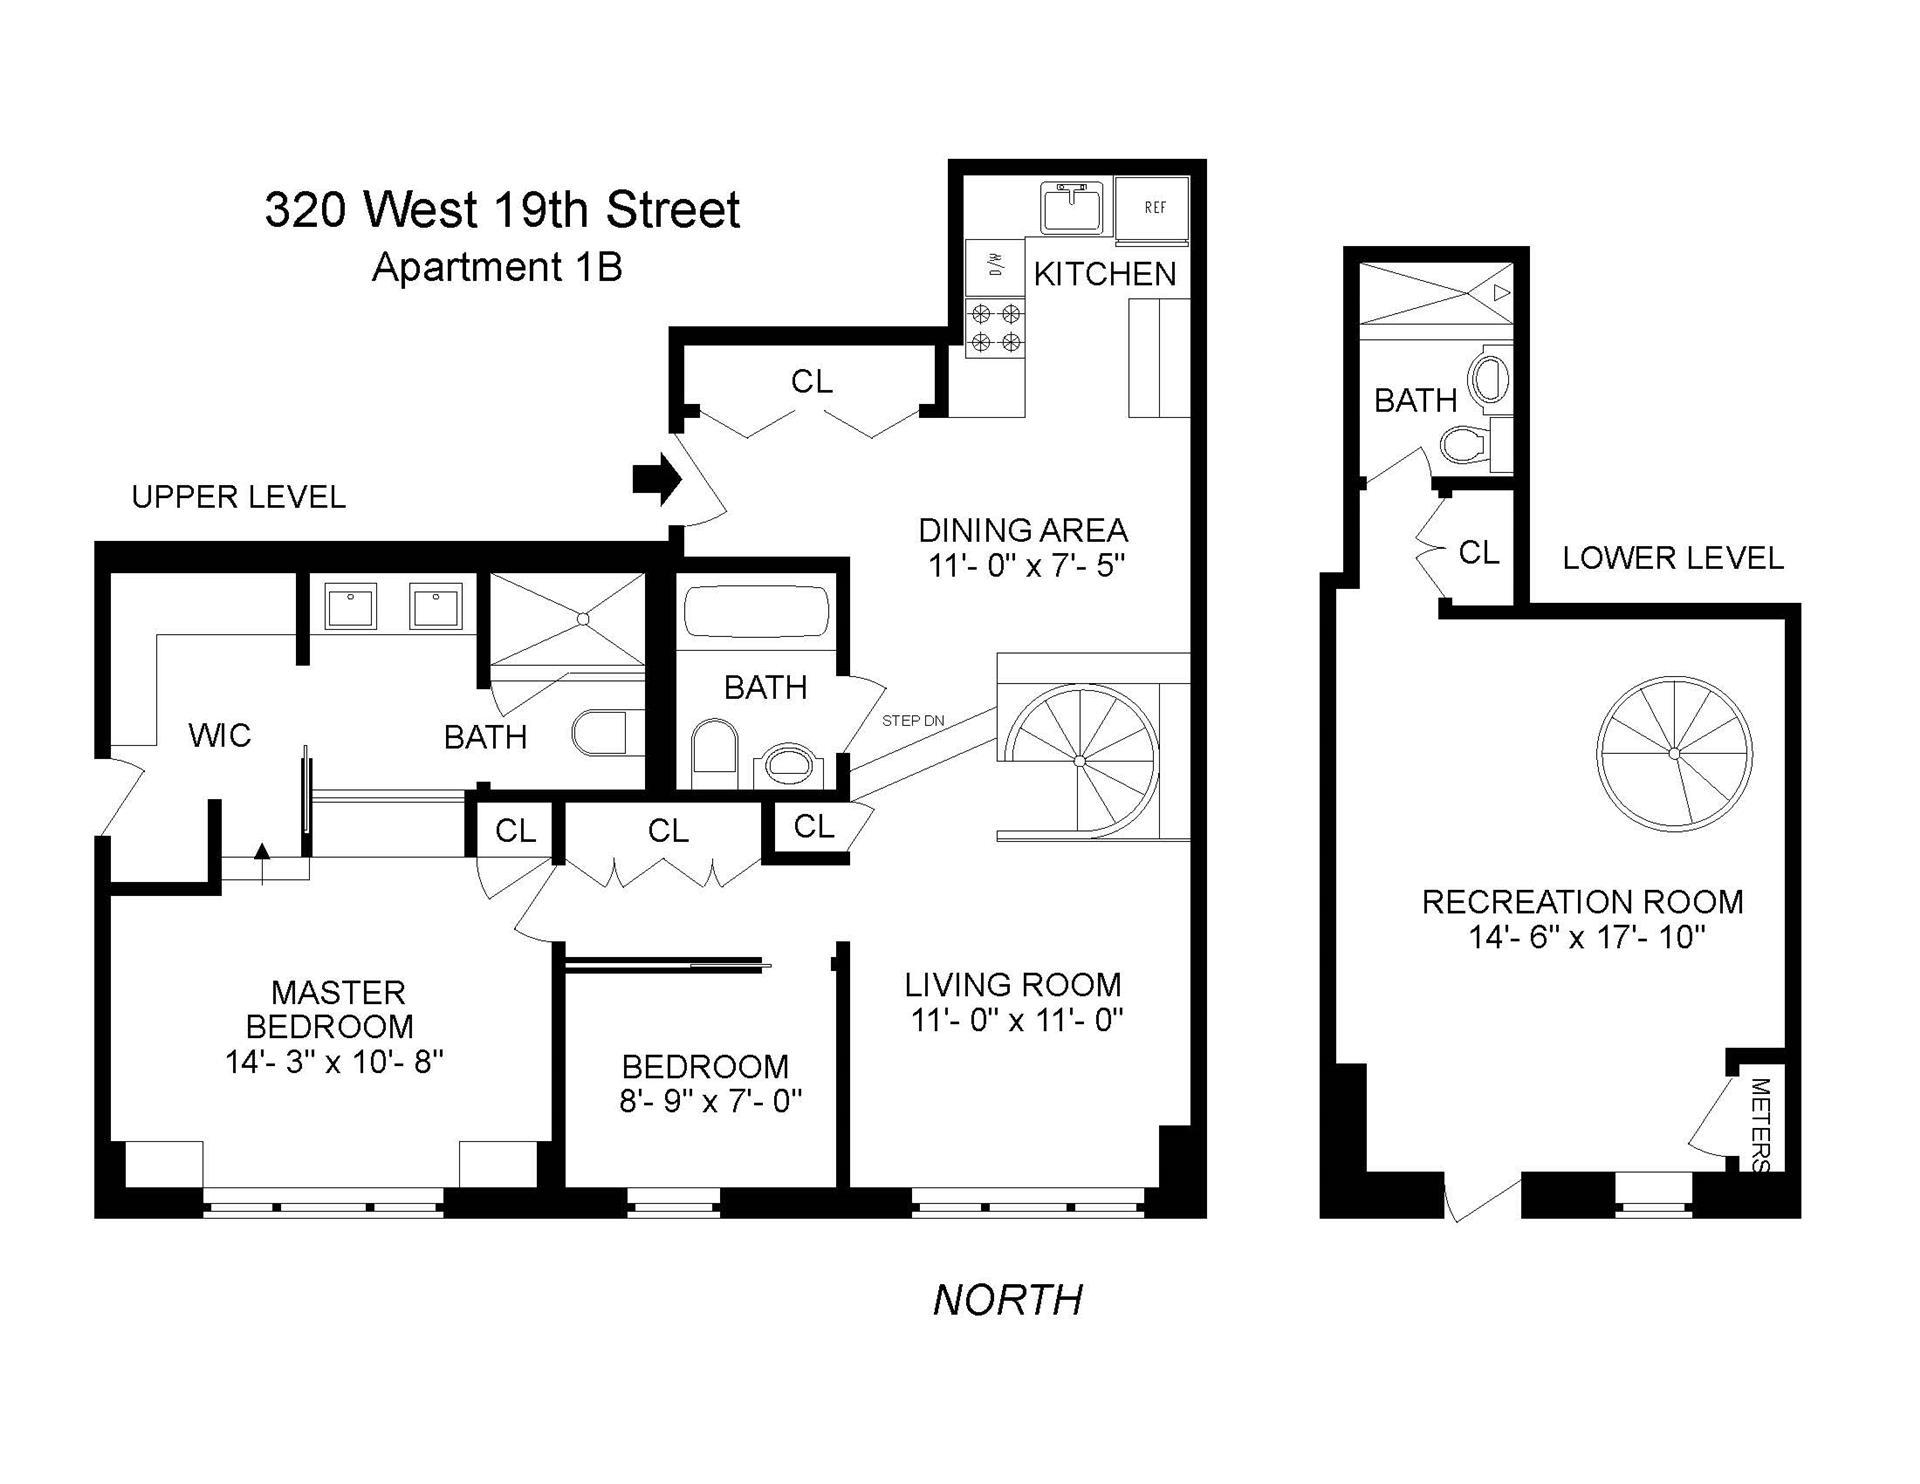 Floor plan of 320 West 19th St, 1B - Chelsea, New York